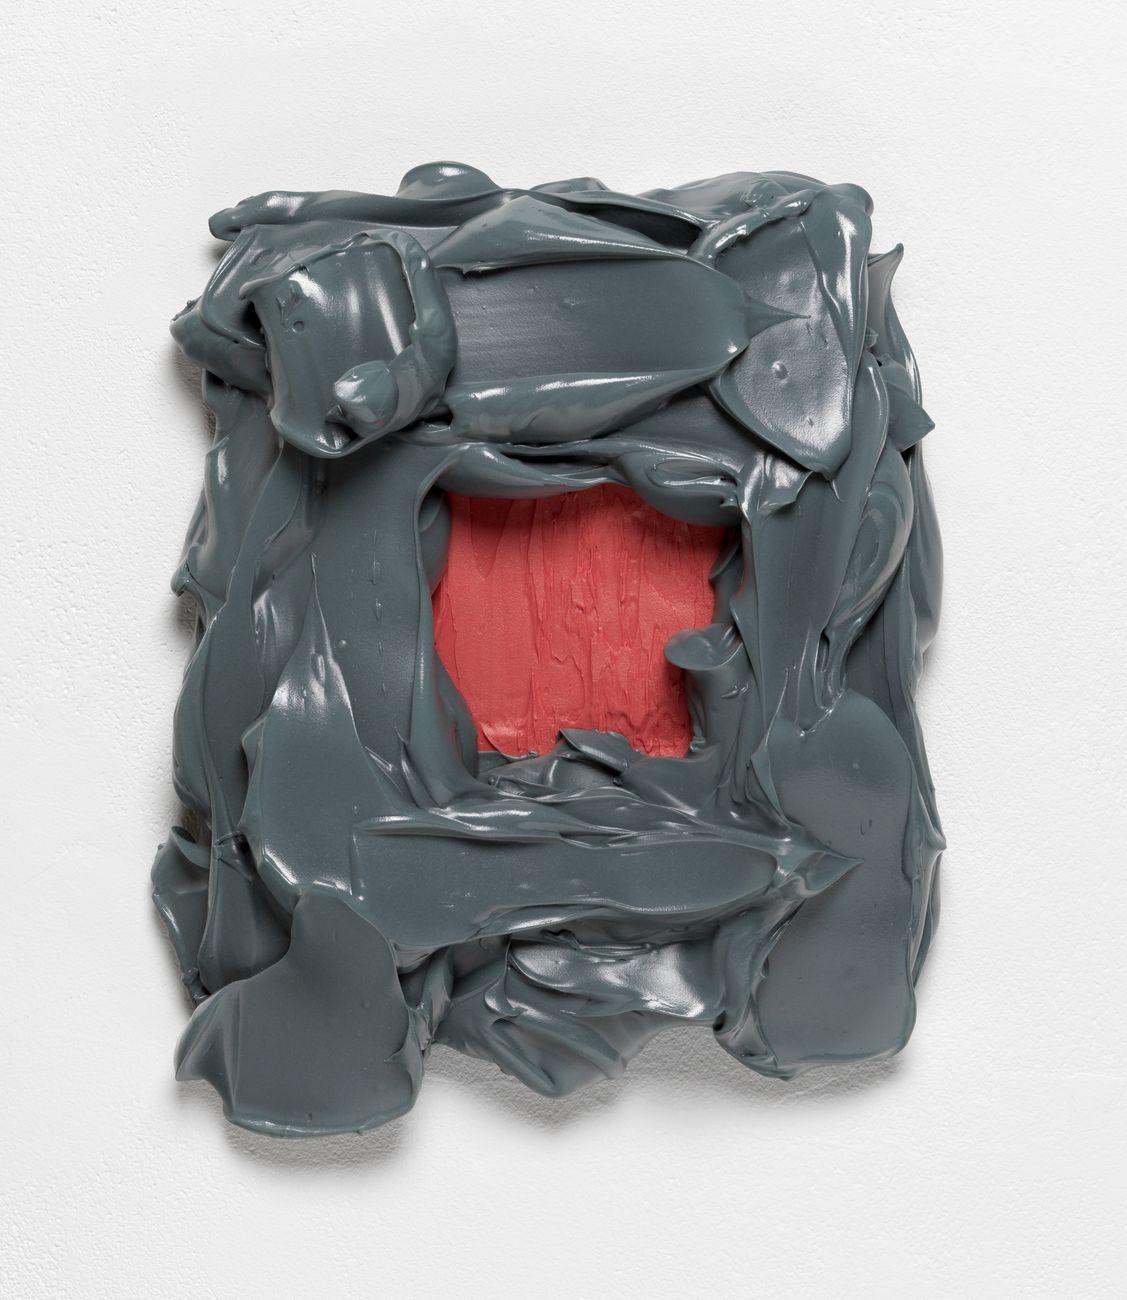 Sam Bakewell, Reckling, I, 2021. Courtesy l'artista & Corvi-Mora, Londra. Photo Marcus Leith